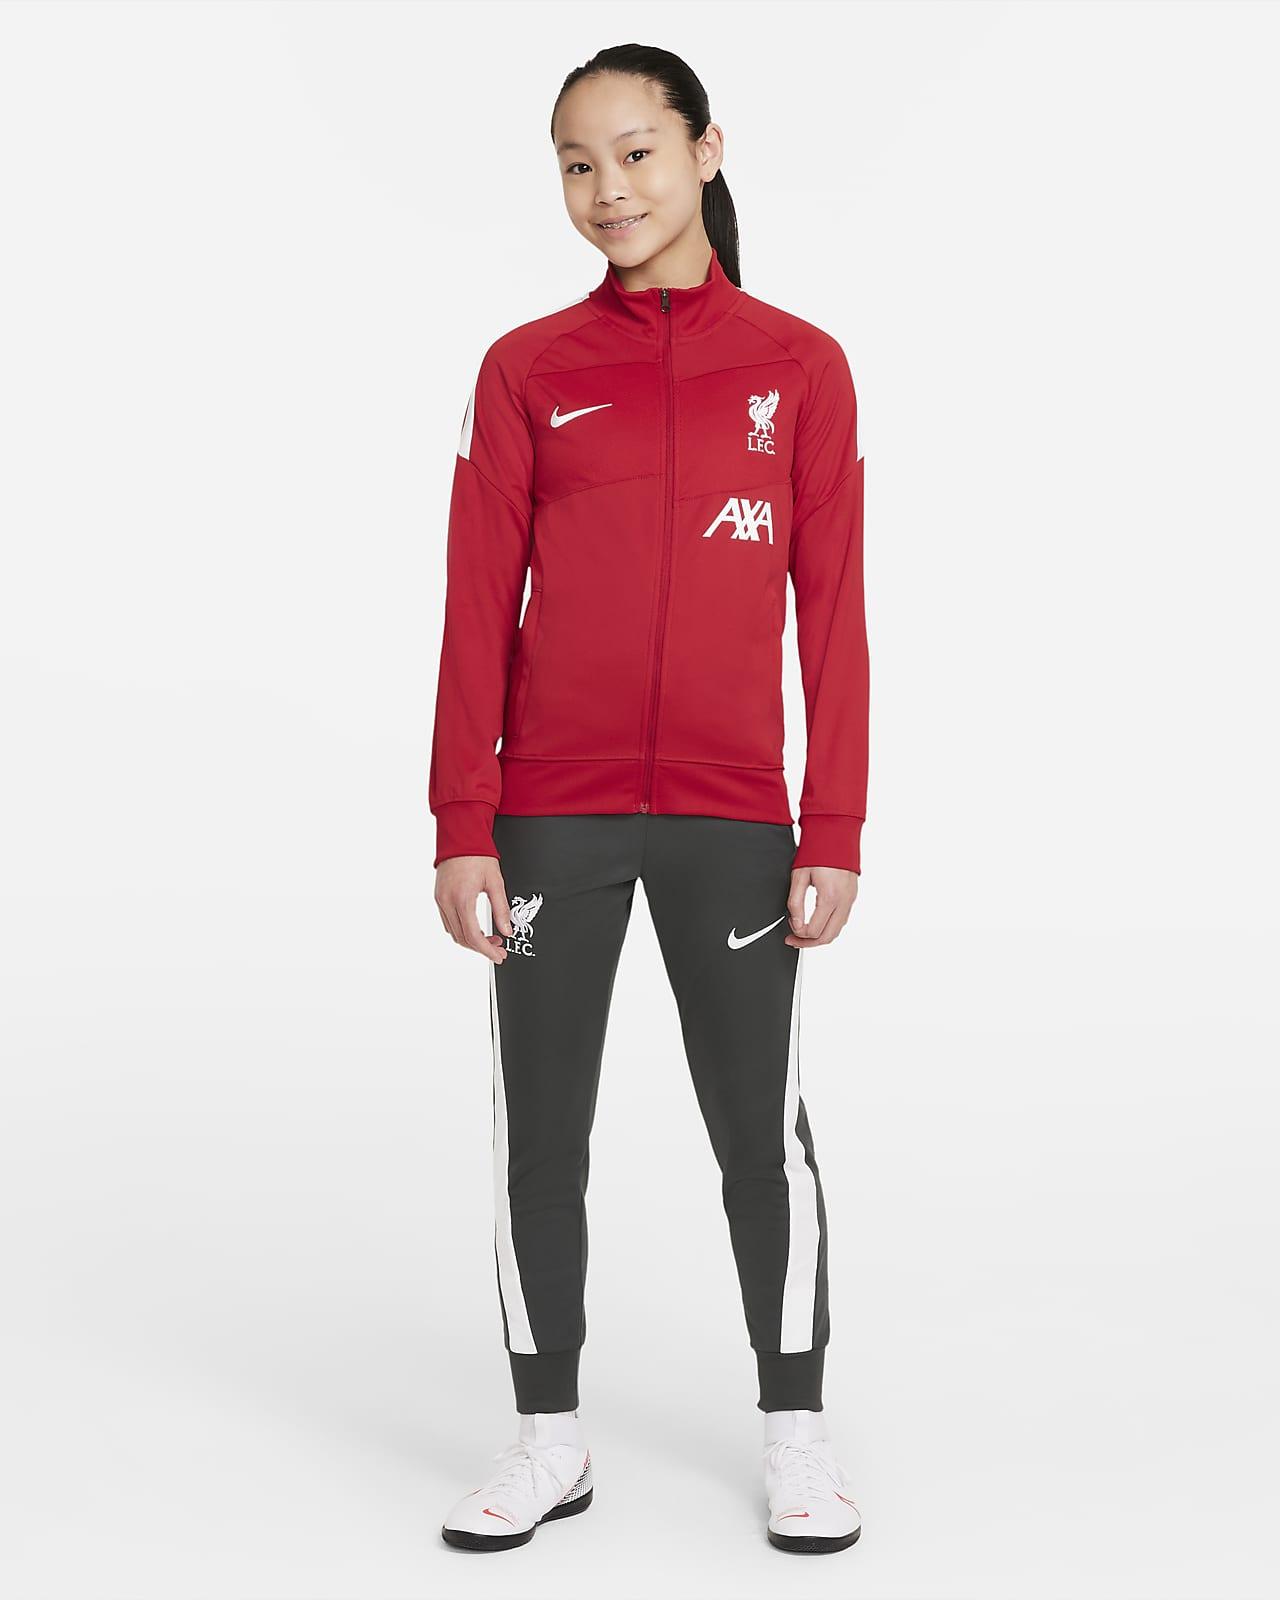 Liverpool FC Academy Pro Nike Dri-FIT Genç Çocuk Futbol Eşofmanı